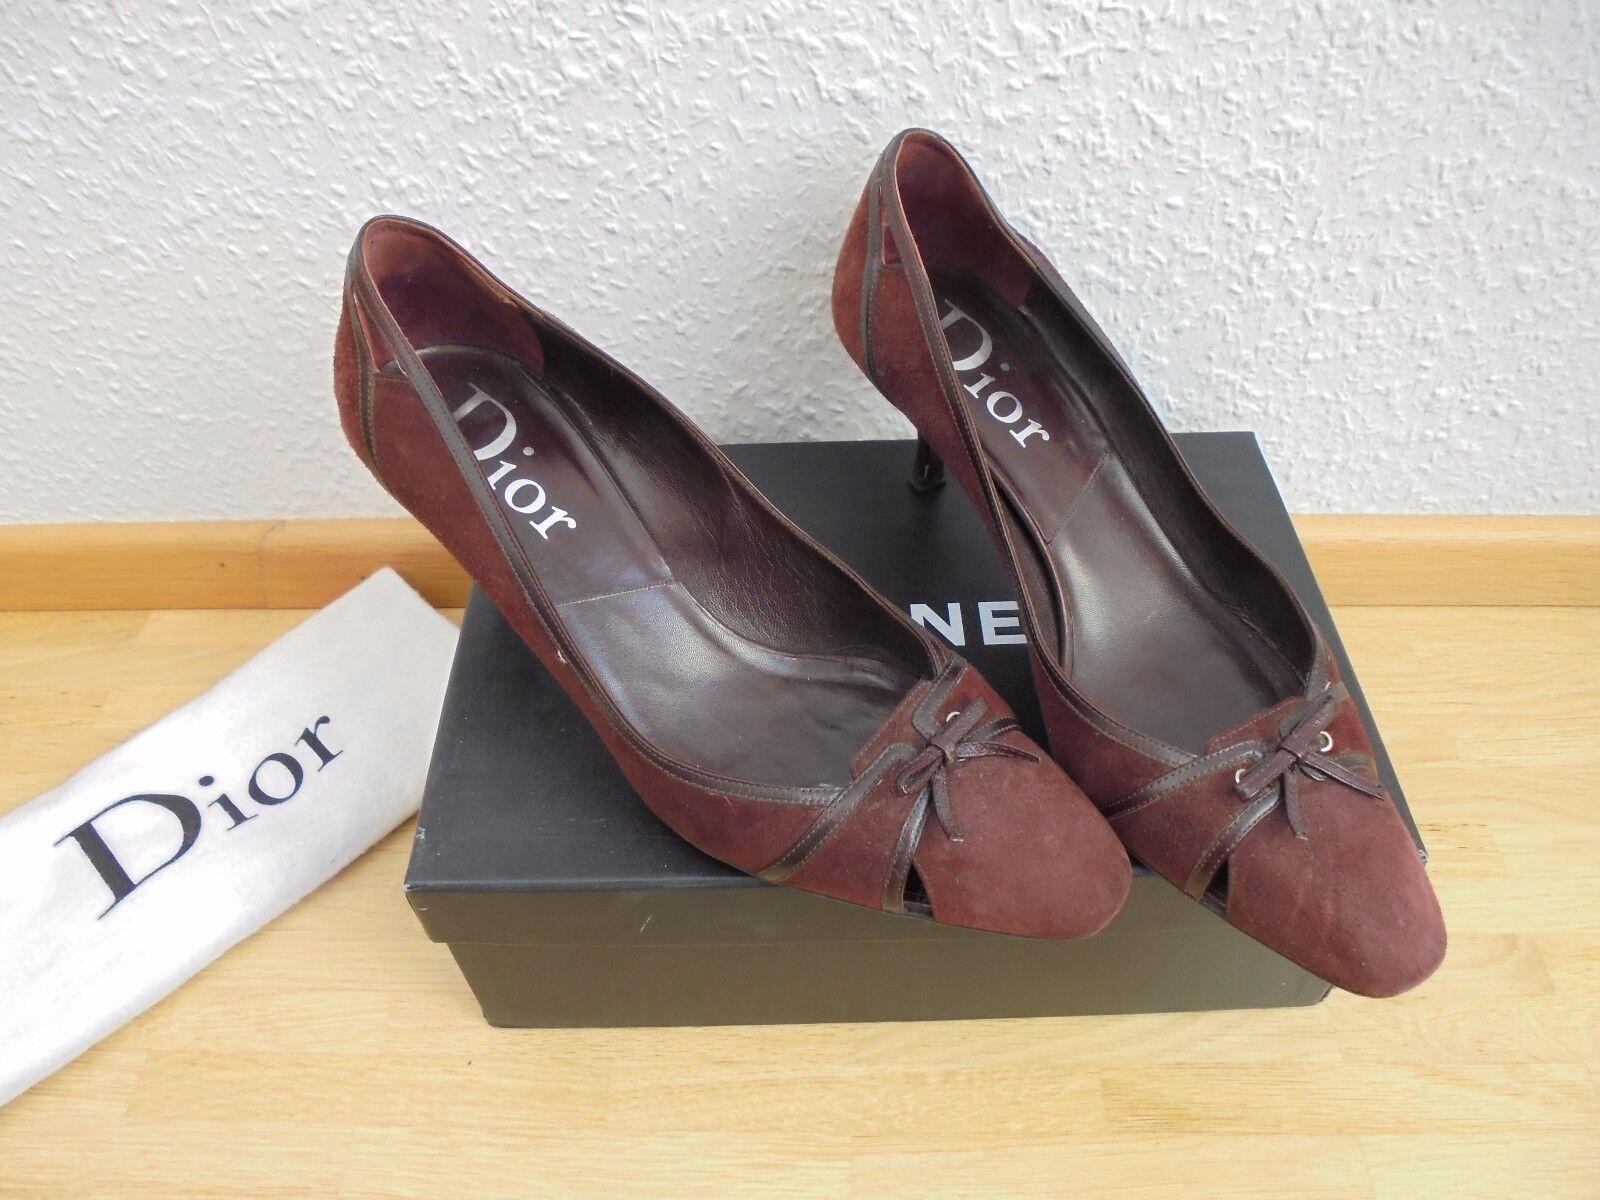 Original Dior Wildleder Pumps NP:  wie NEU Luxus Schuhe High Heels Gr. 40